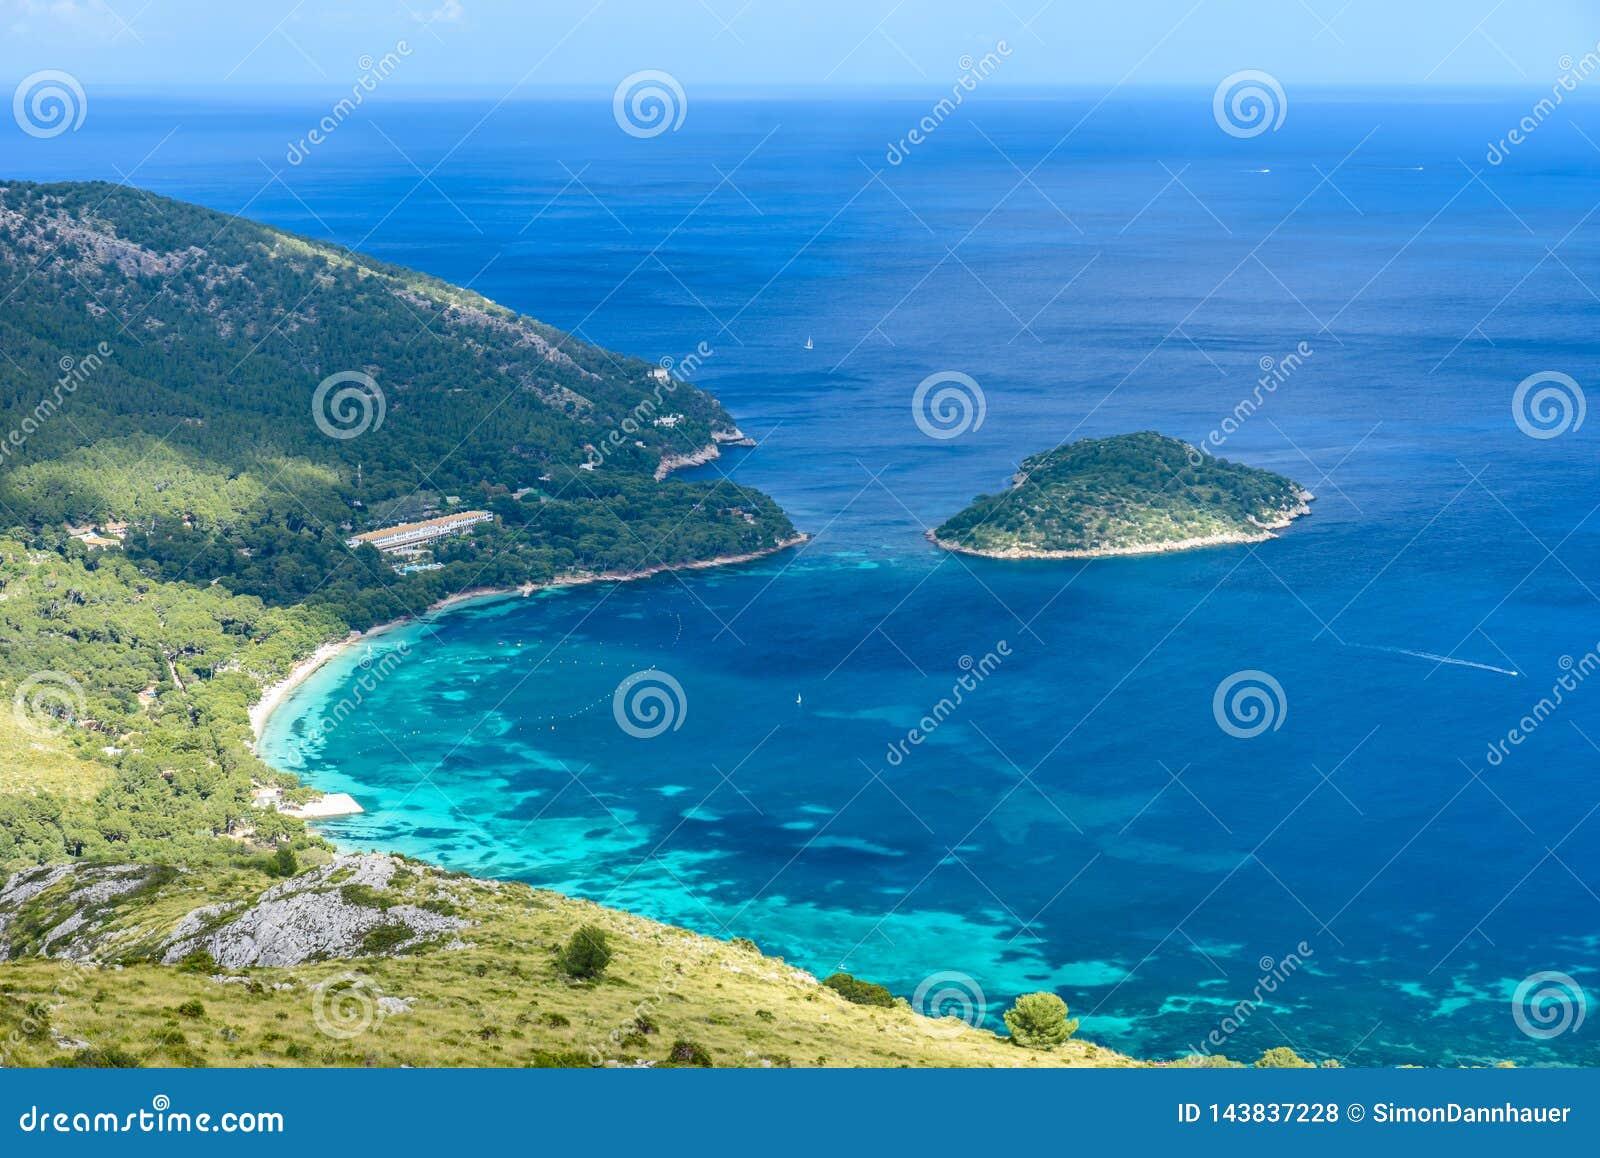 Playa DE Formentor - mooie kust van Mallorca - Spanje, Europa